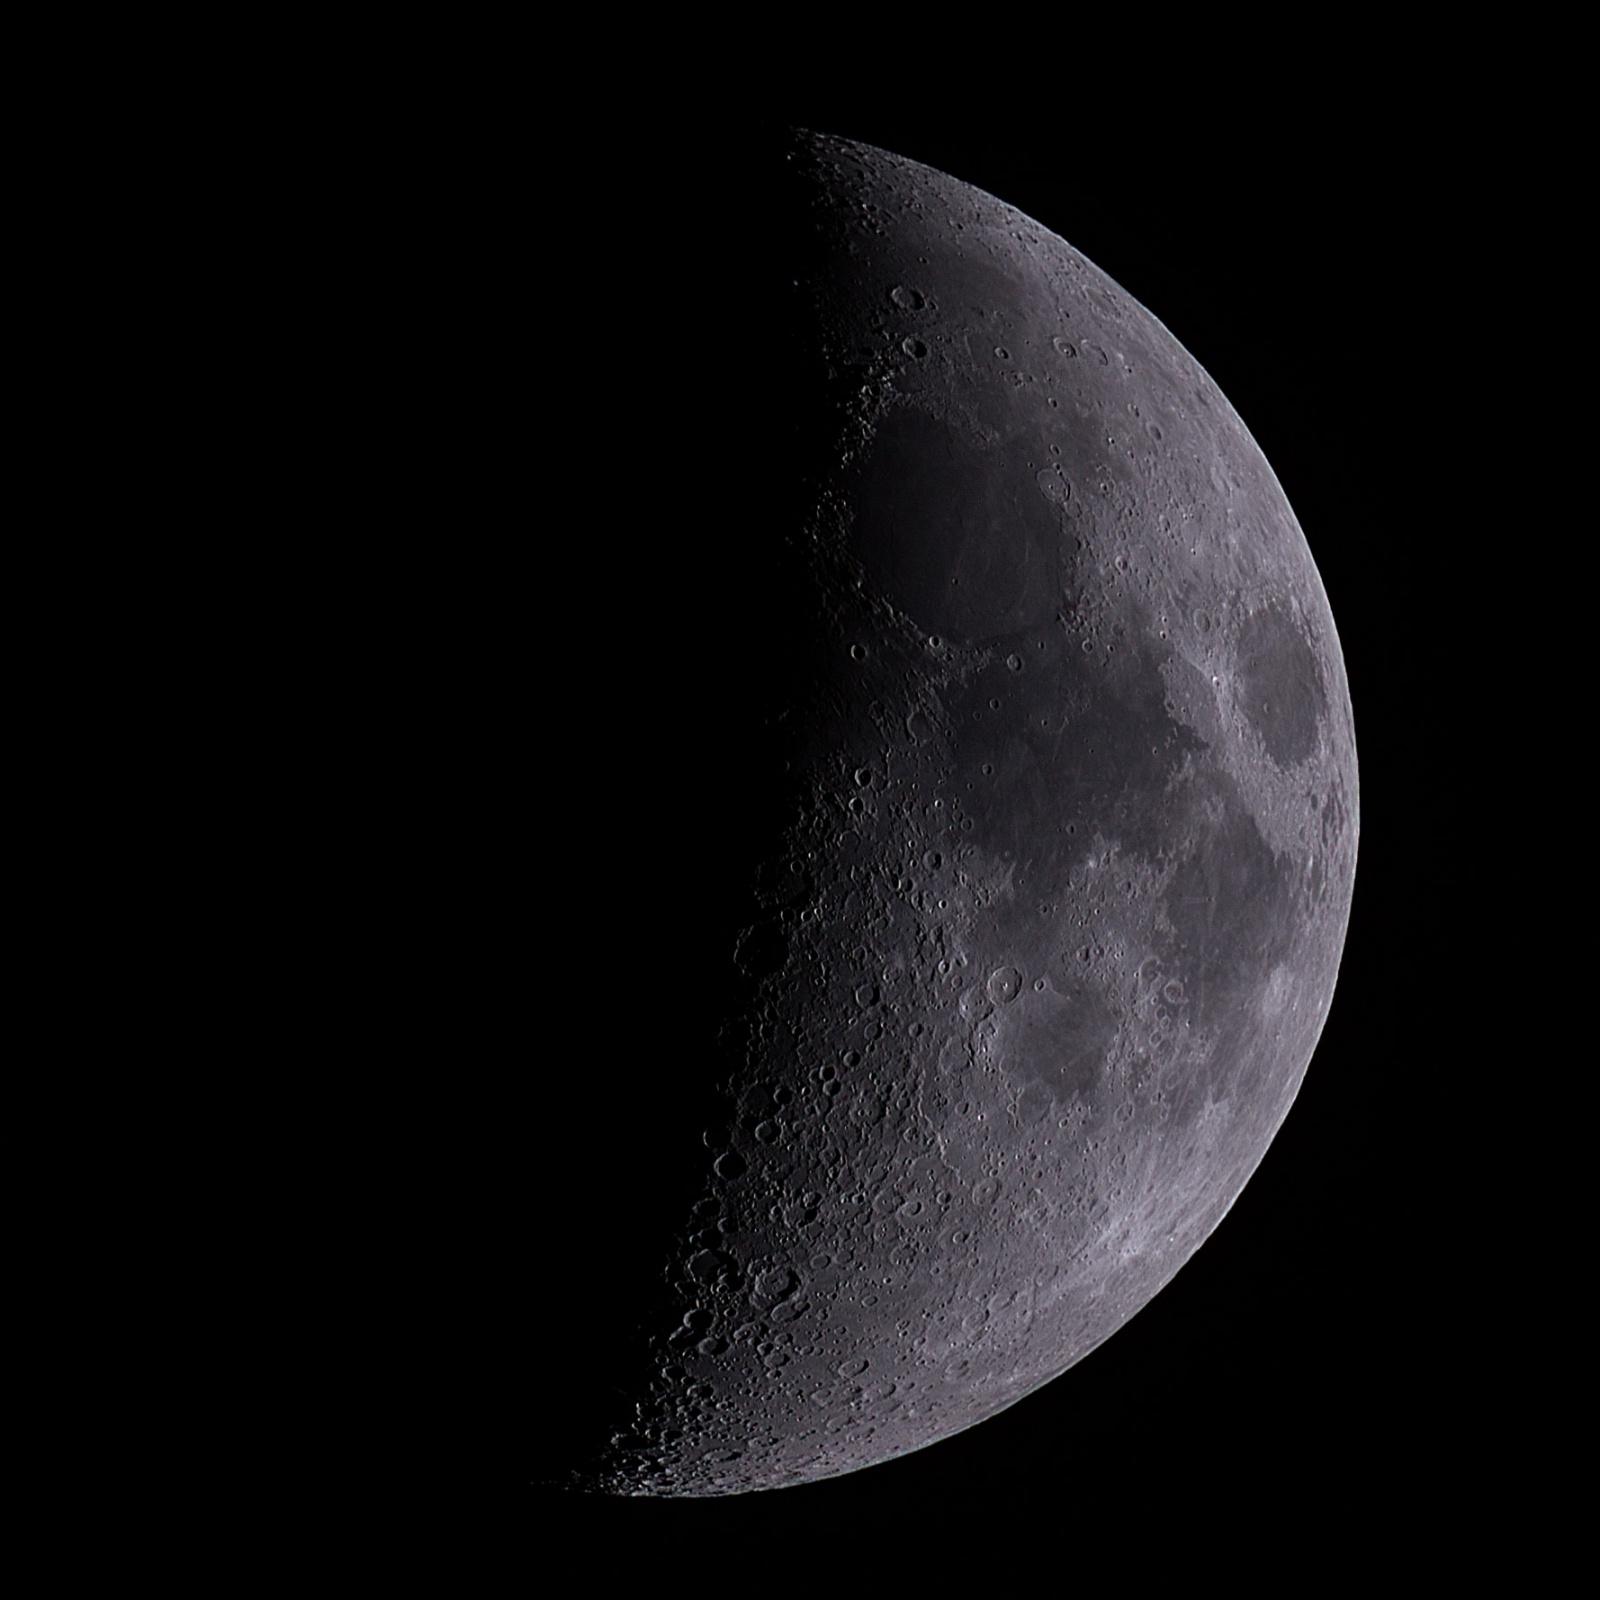 moo-2021-03-20--002.thumb.jpg.4a72682e08b3bb55925bcdb18e019b17.jpg